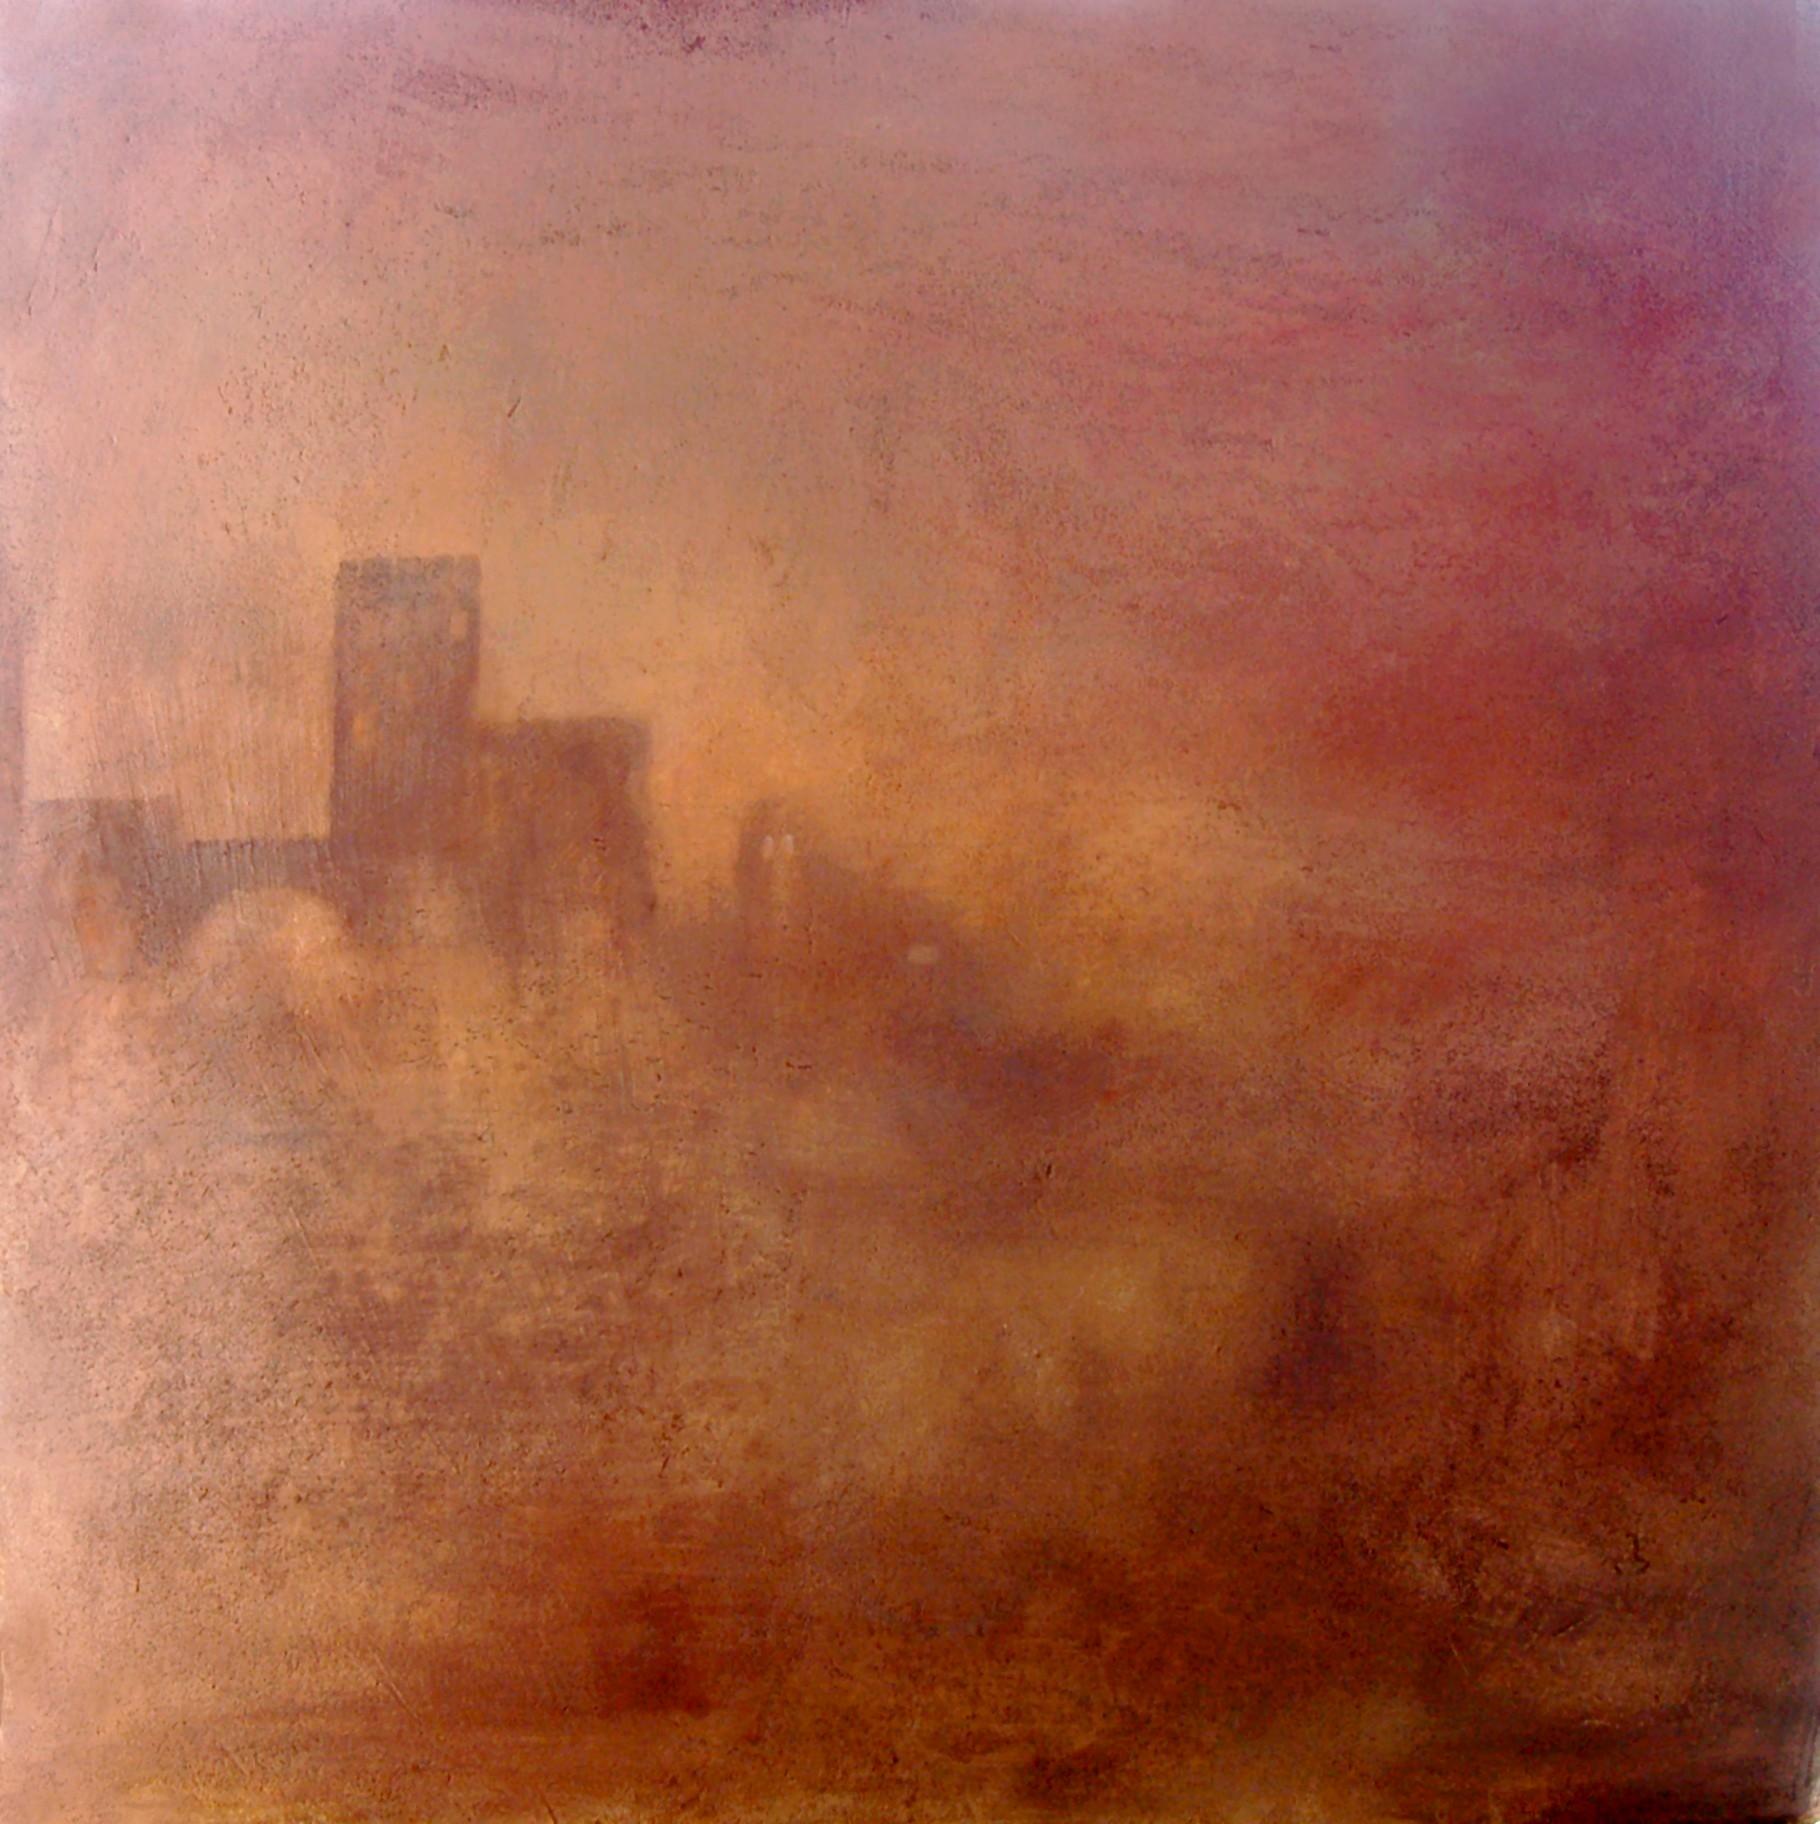 Citadel in the mist